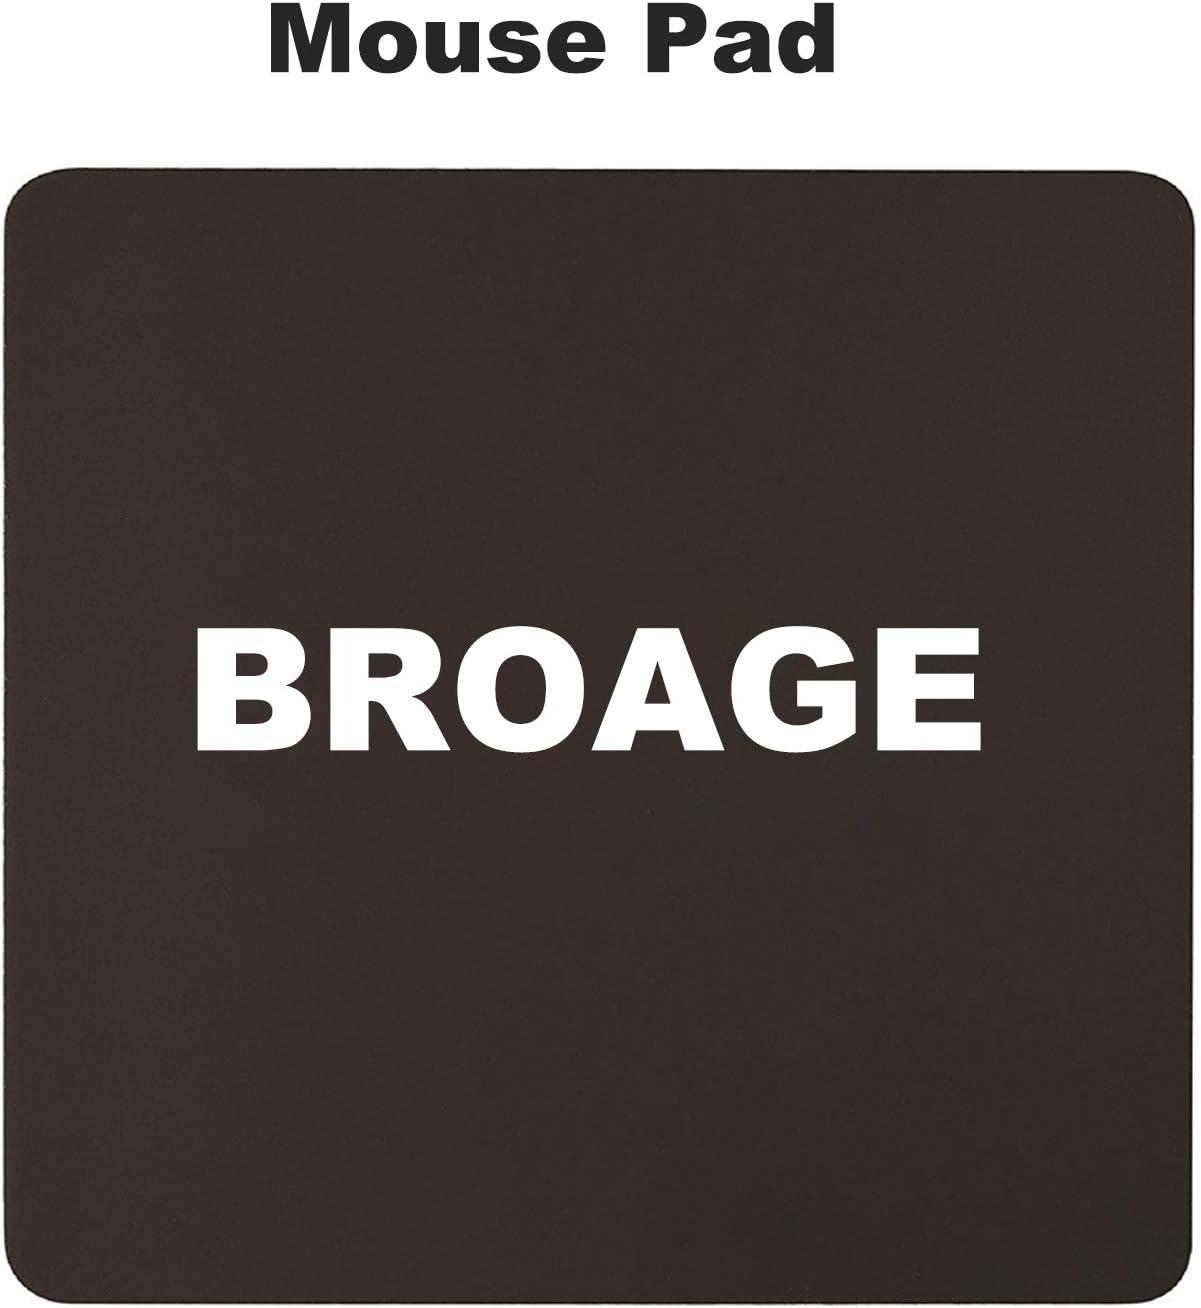 1TB HDD DVDRW/_ Windows 10/_ BROAGE Mouse Pad 2020 HP 24 AIO 23.8 FHD All in One Desktop Computer/_ 10th Gen Intel Quad-Core i5-10210U up to 4.2GHz 1TB PCIe SSD /_ 16GB DDR4 RAM Beats i7-7500U